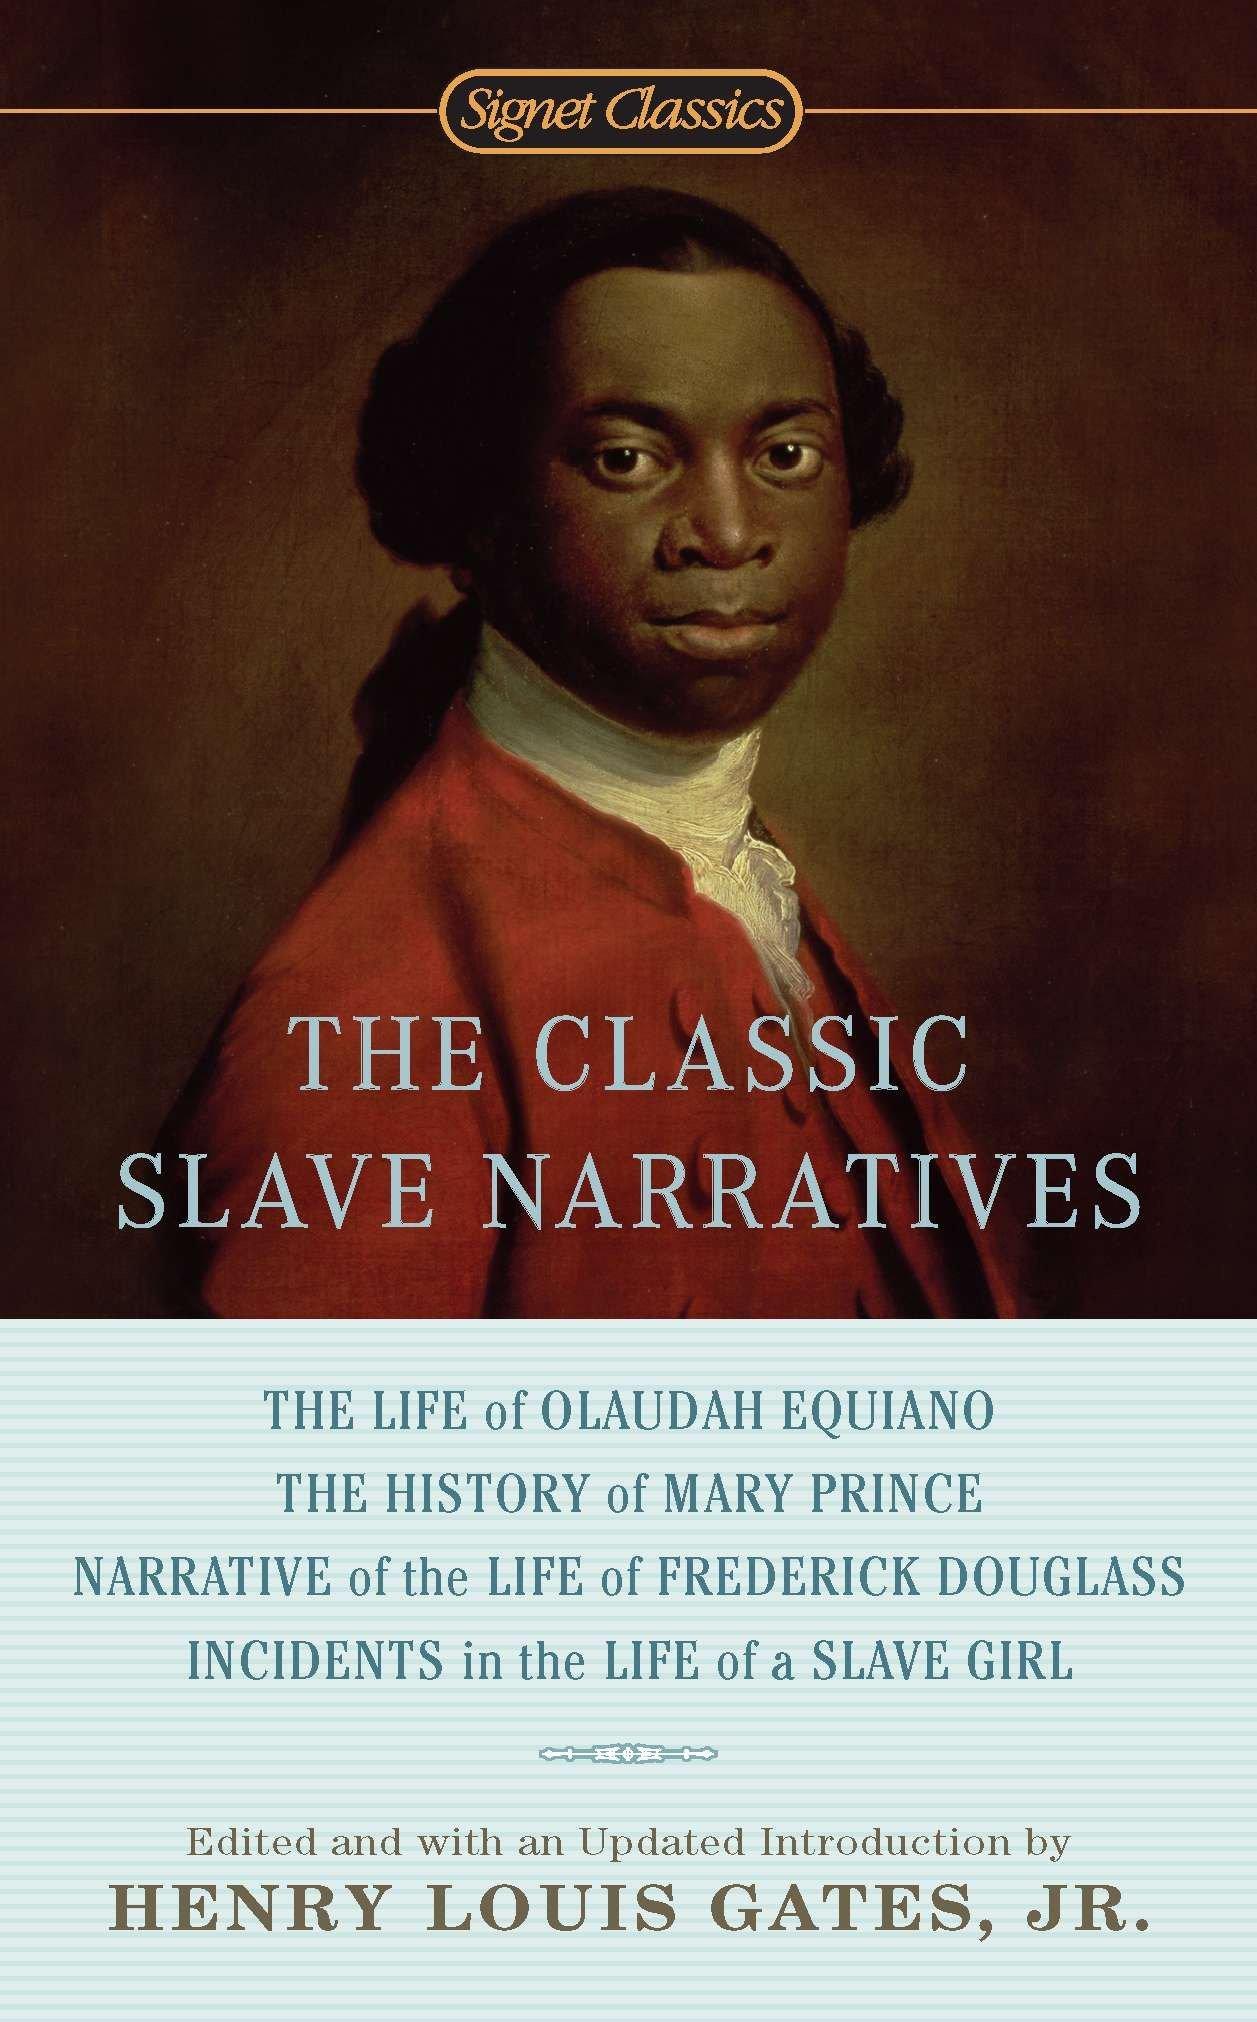 Black Indian Slave Narratives (Reak Voices, Real History)